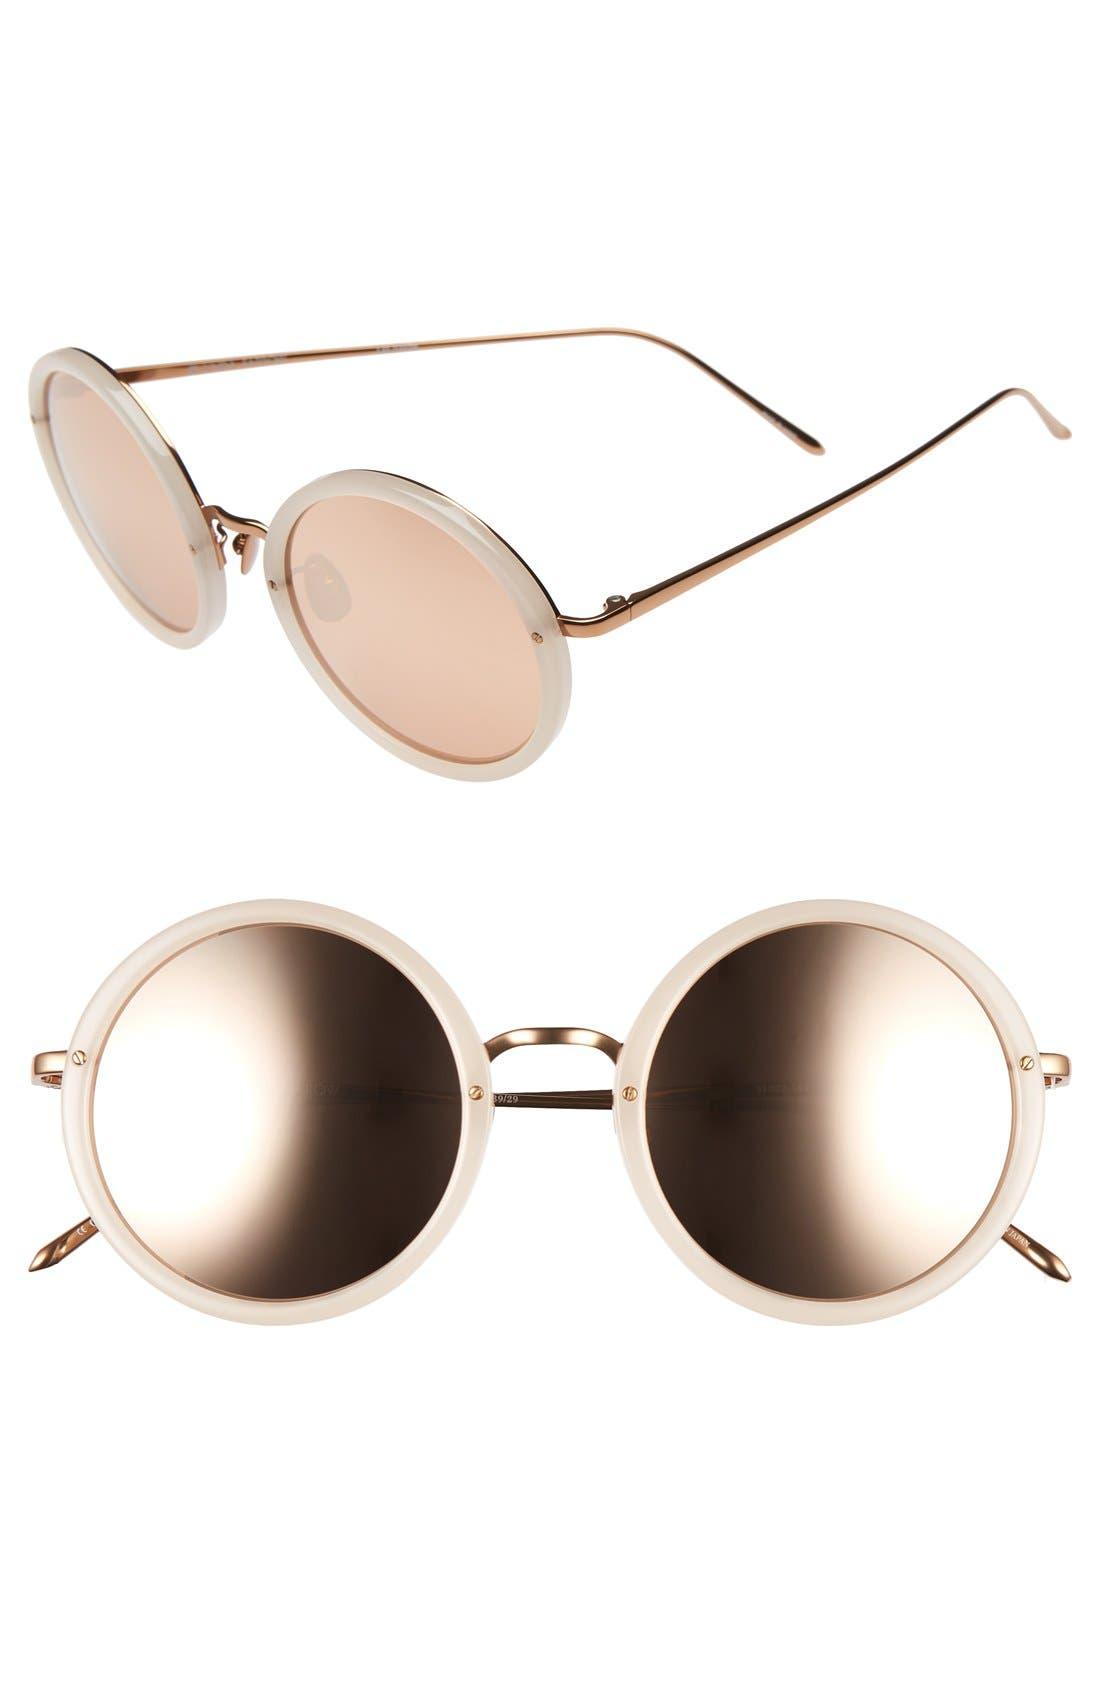 51mm Round 18 Karat Rose Gold Trim Sunglasses,                             Main thumbnail 1, color,                             680